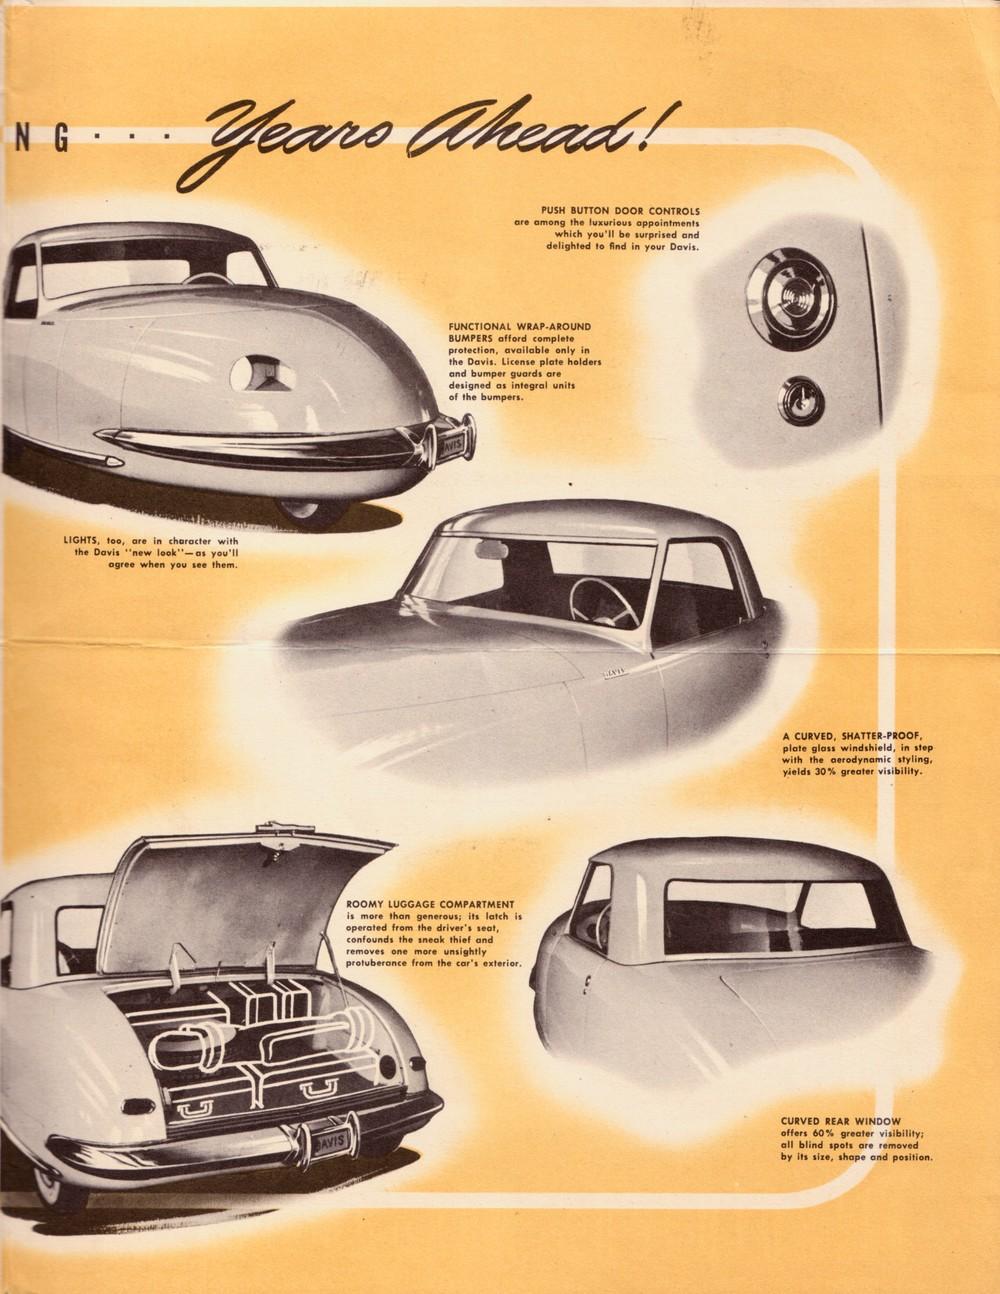 Davis.1948.brochure pg2.jpg